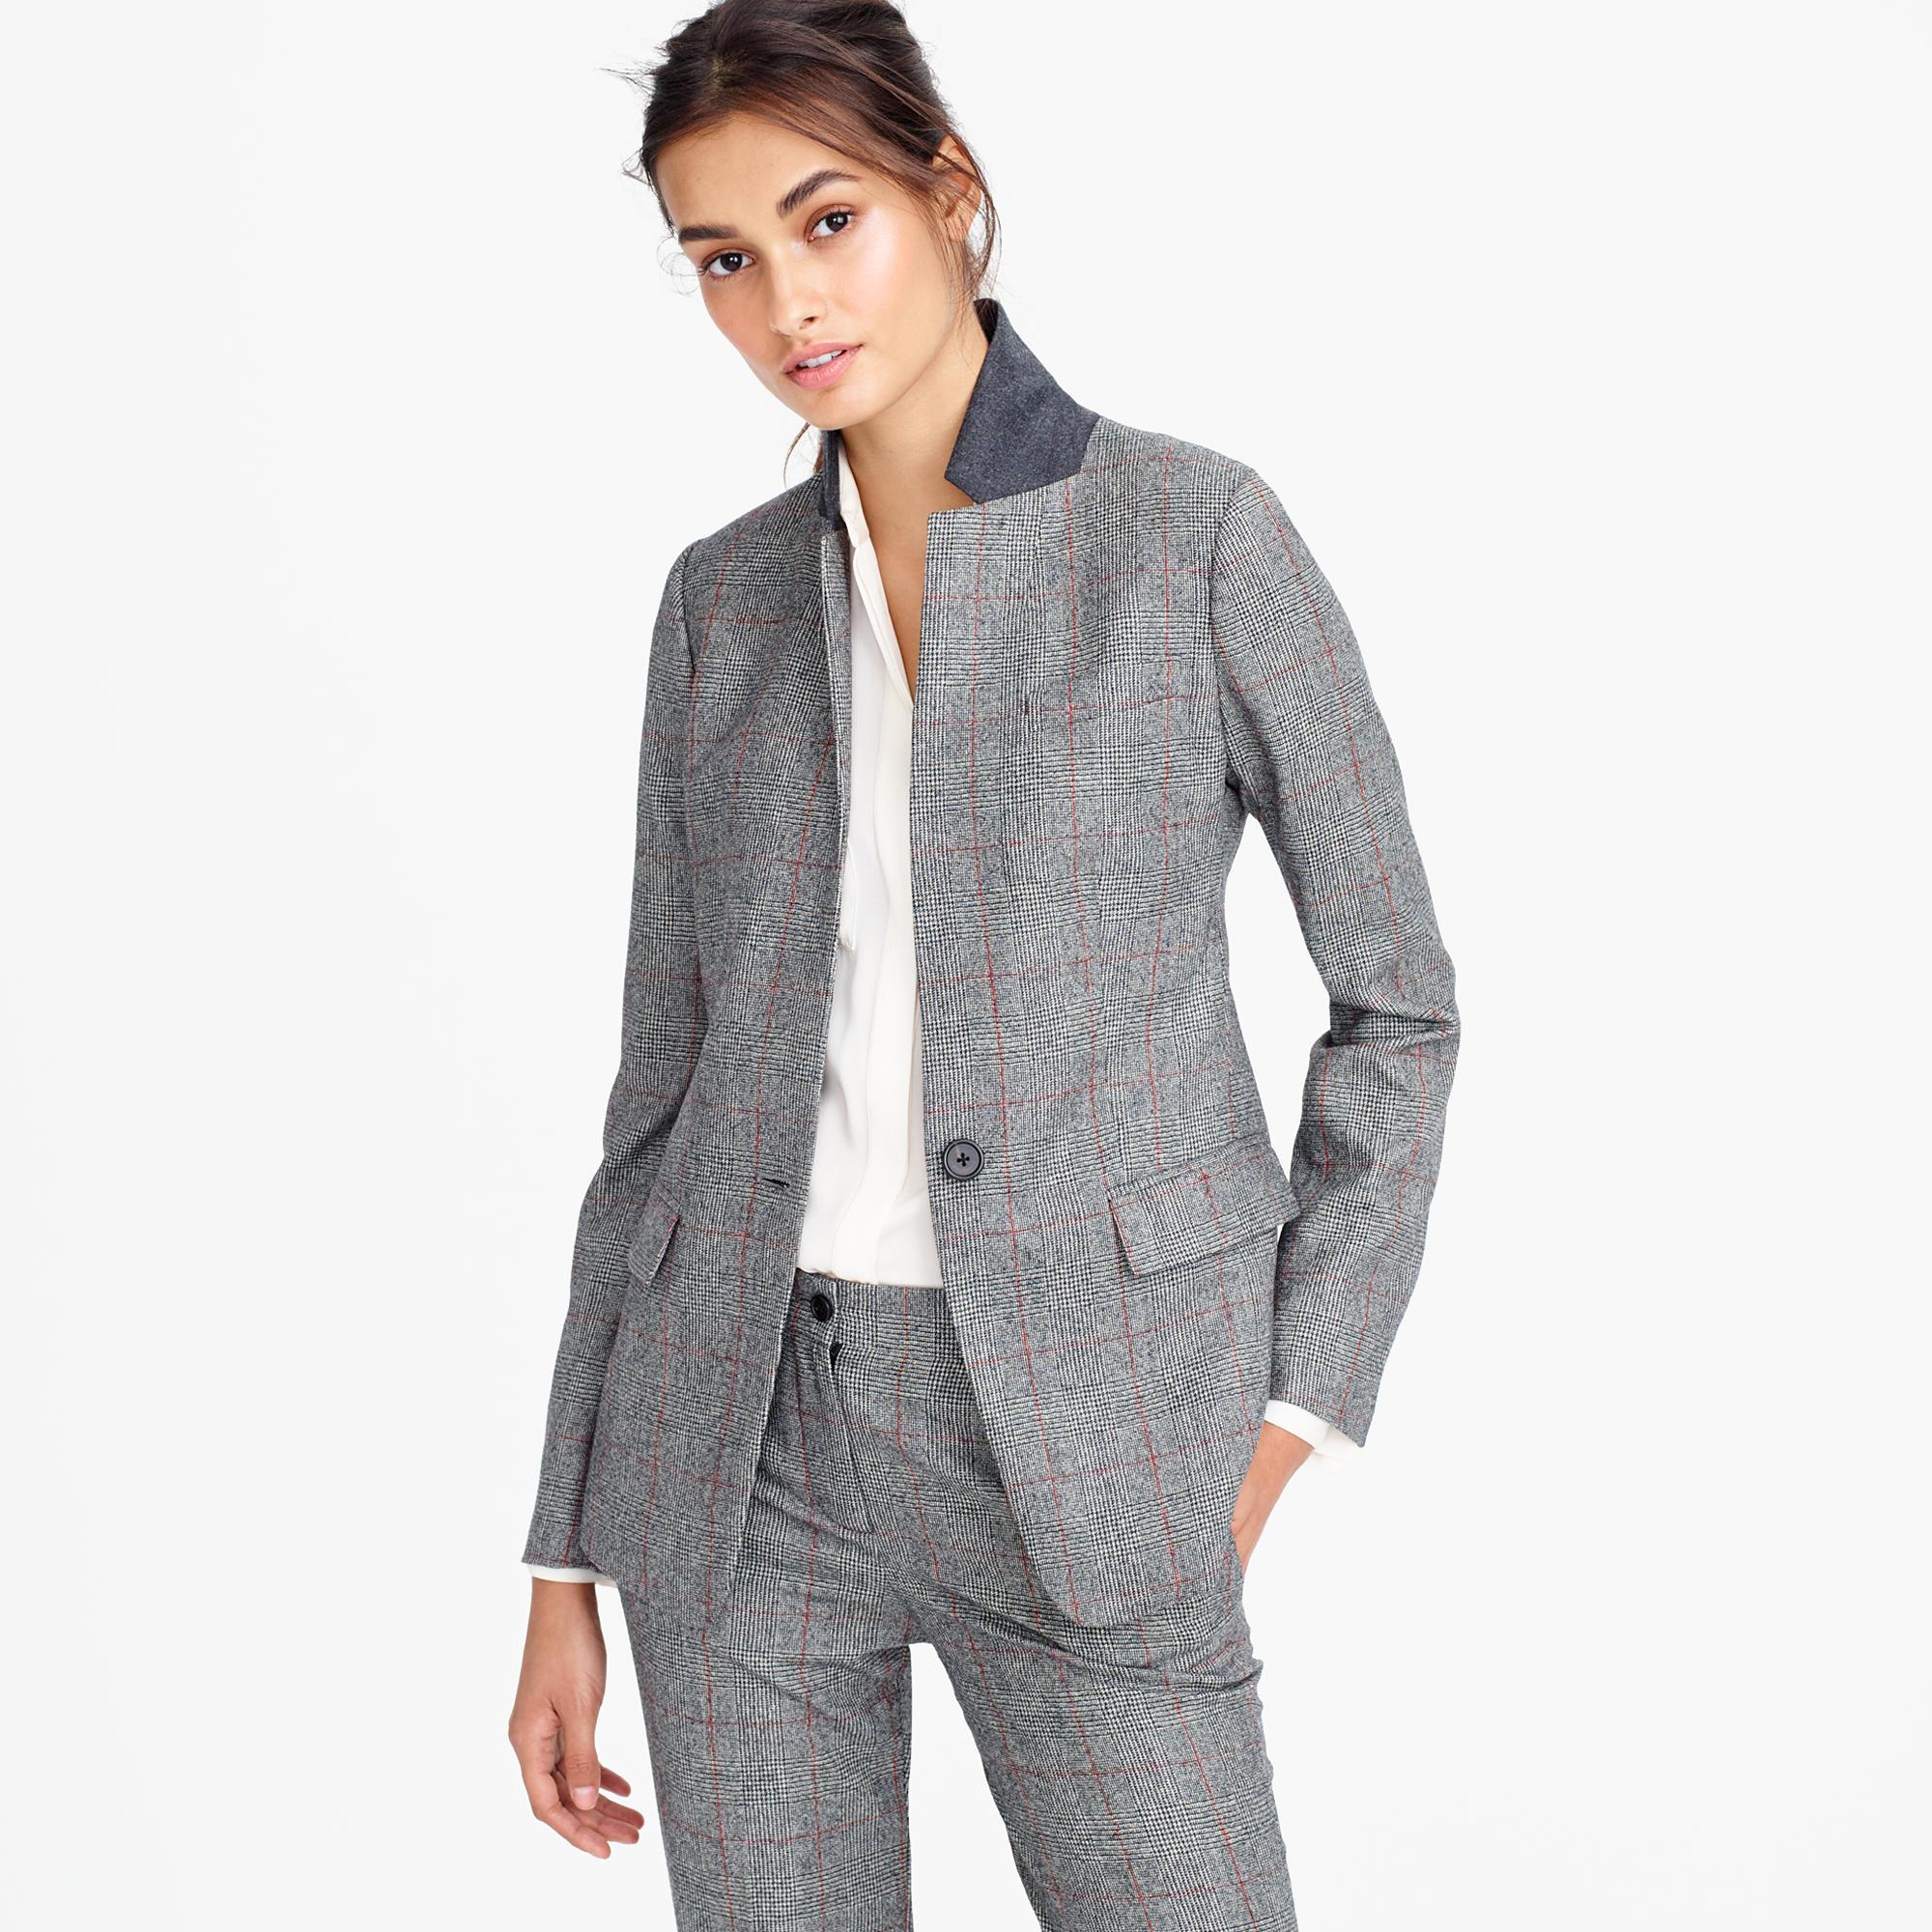 Women's Dress Suits & Wool Suits : Women's Suiting | J.Crew